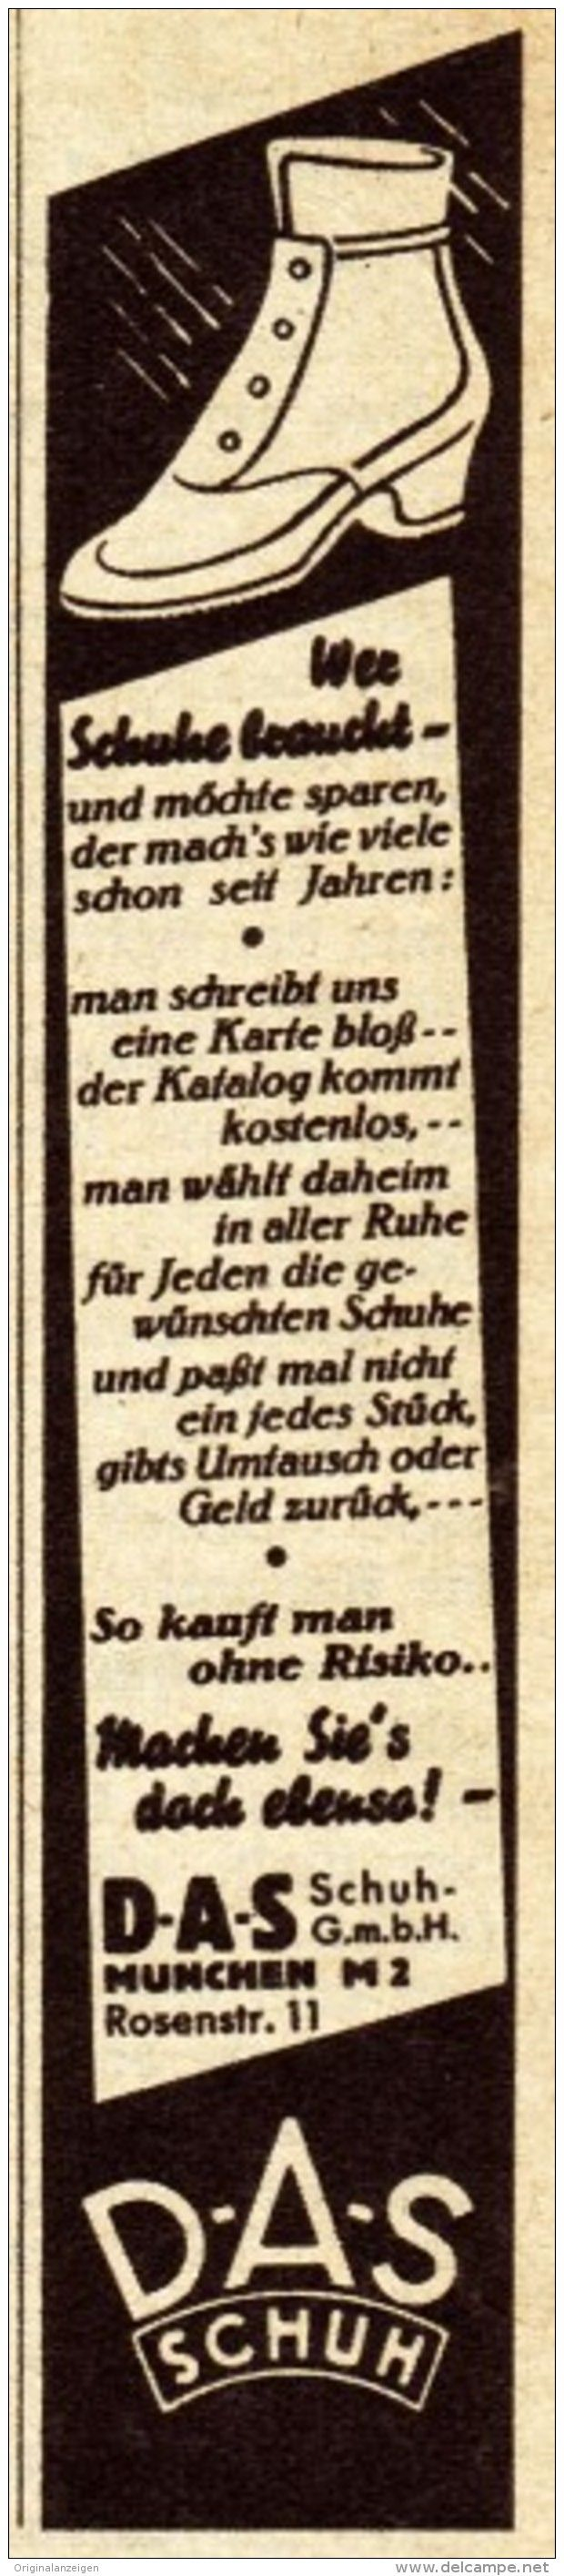 Original-Werbung / Anzeige 1938 - D-A-S SCHUH GMBH MÜNCHEN - ca. 25 x 110 mm